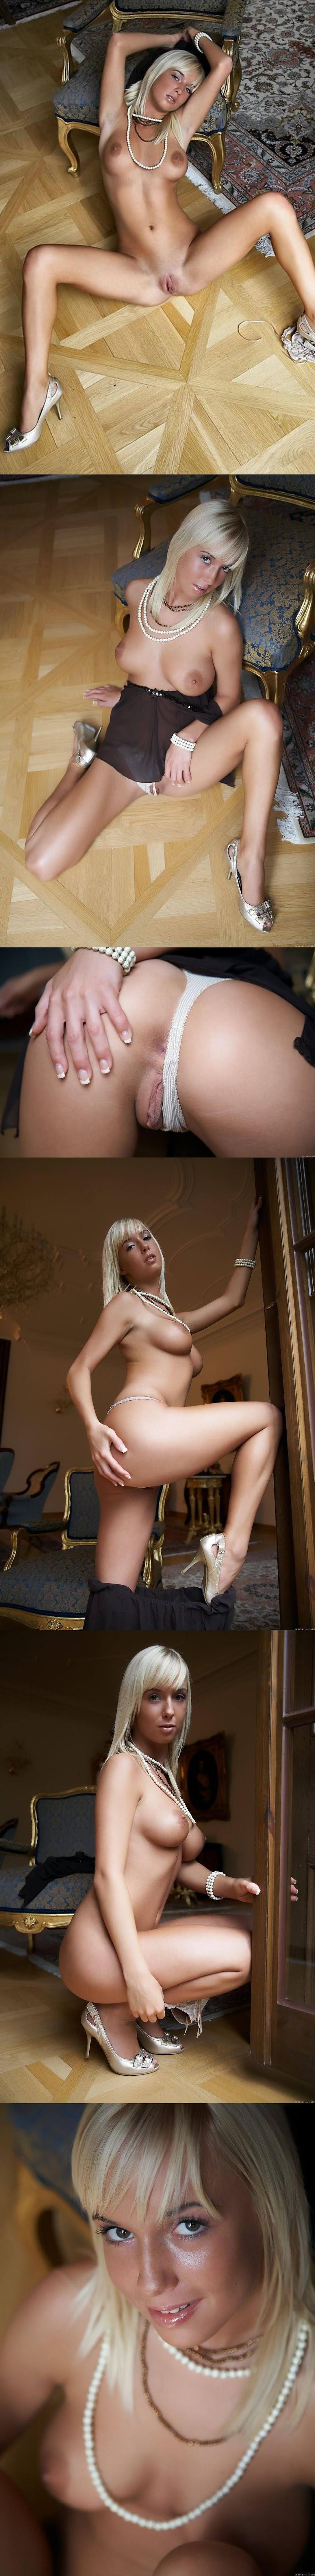 MA_20080819_-_Louisa_A_-_Presenting_-_by_Tony_Murano.zip-jk- Met-Art MA 20080820 - Emma A - Presenting - by Erro